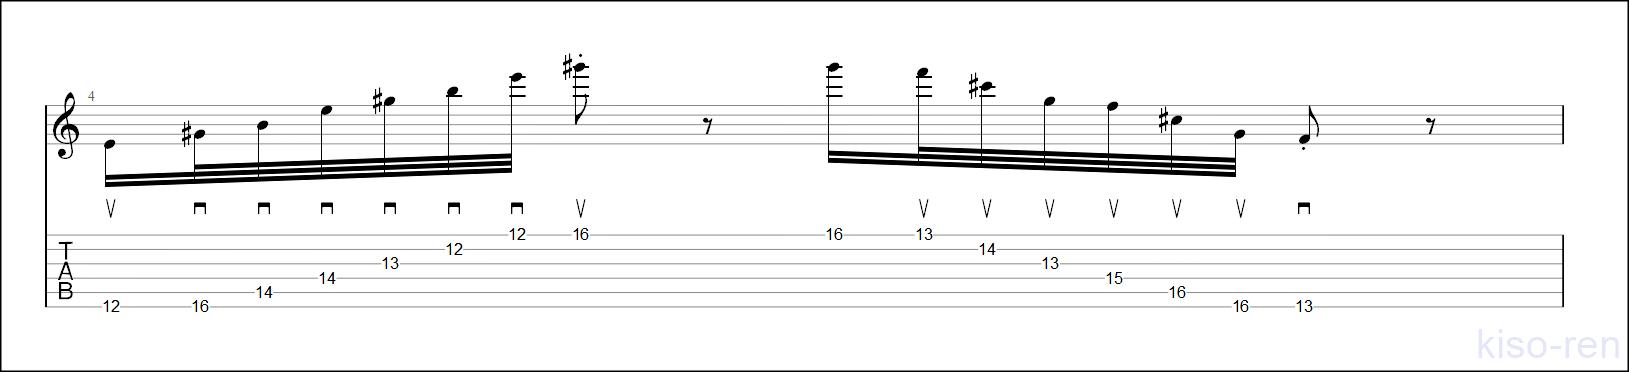 E D# Sweep Picking【TAB】Big Sweep Picking John Petrucci  6弦スウィープピッキング ジョン・ペトルーシ 練習【Practice TAB】